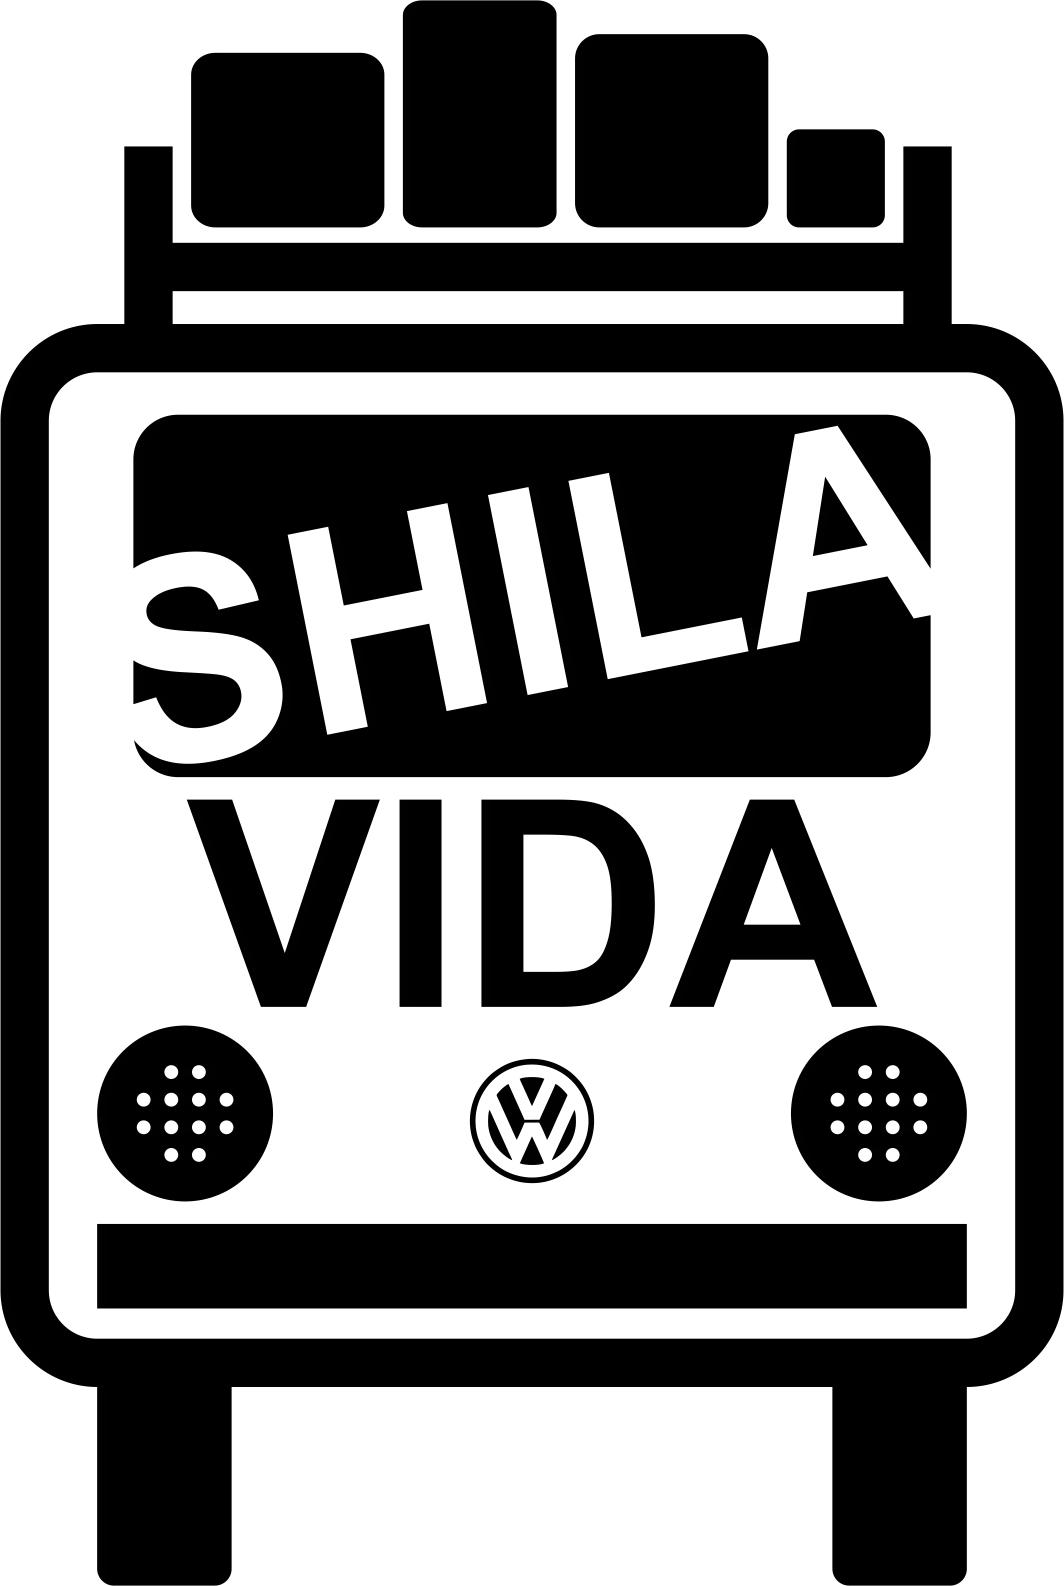 shilavida